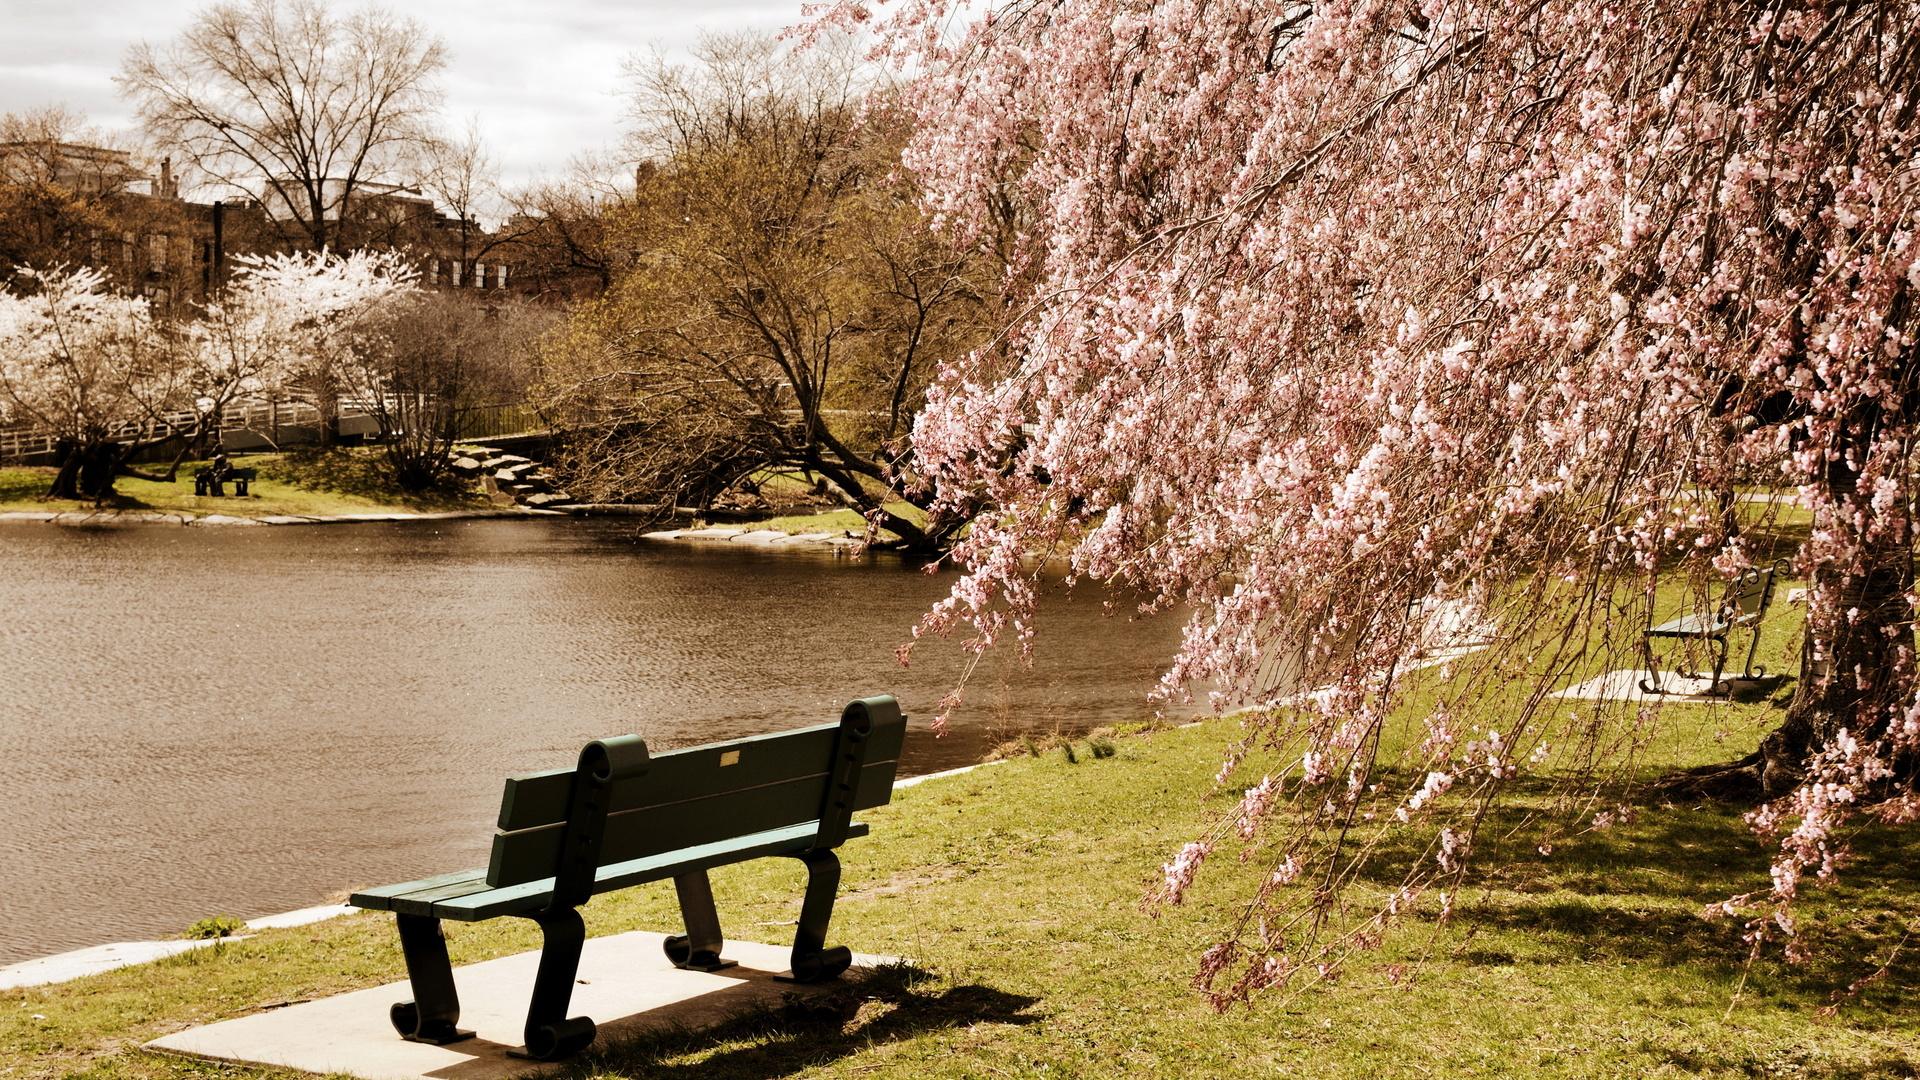 парк, деревья, boston, пруд, massachusetts, скамейка, сша